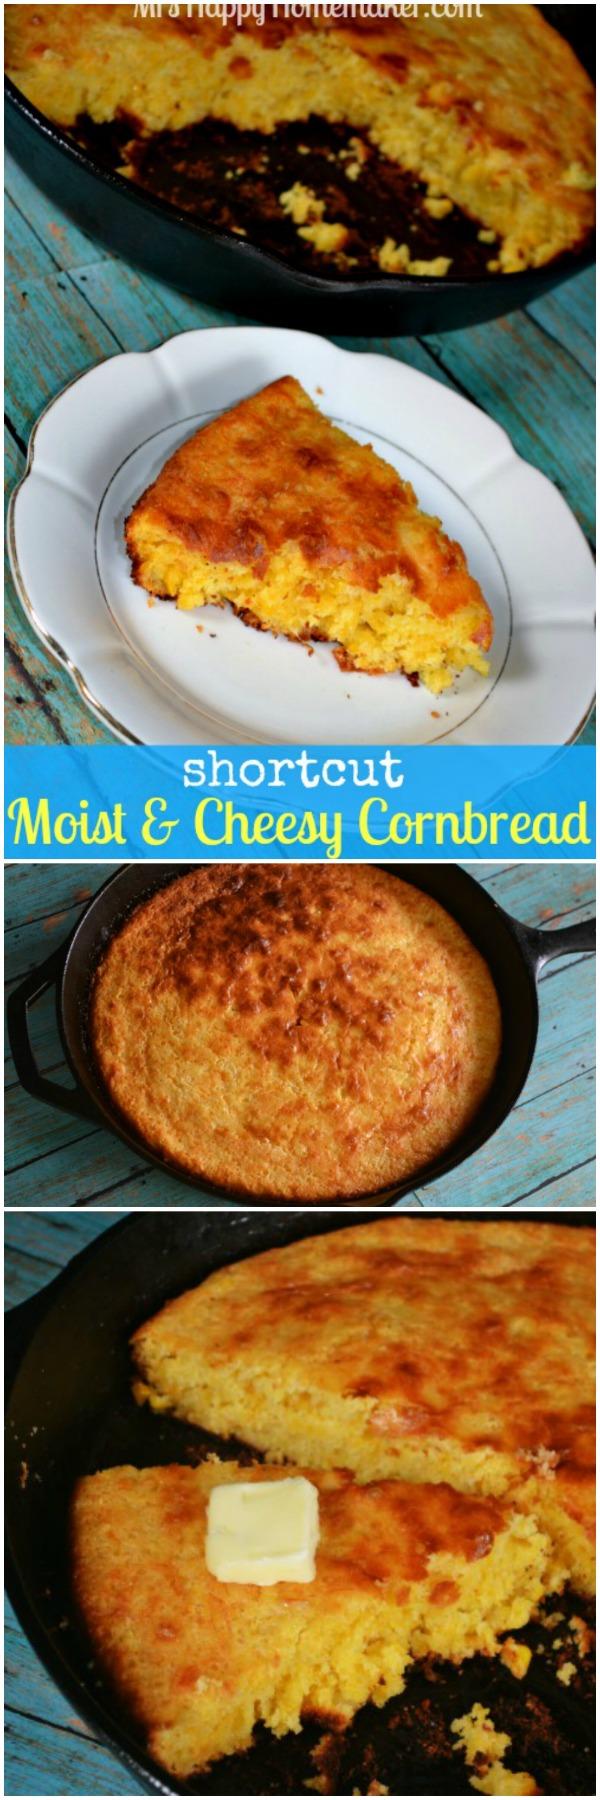 Shortcut Moist and Cheesy Cornbread | MrsHappyHomemaker.com